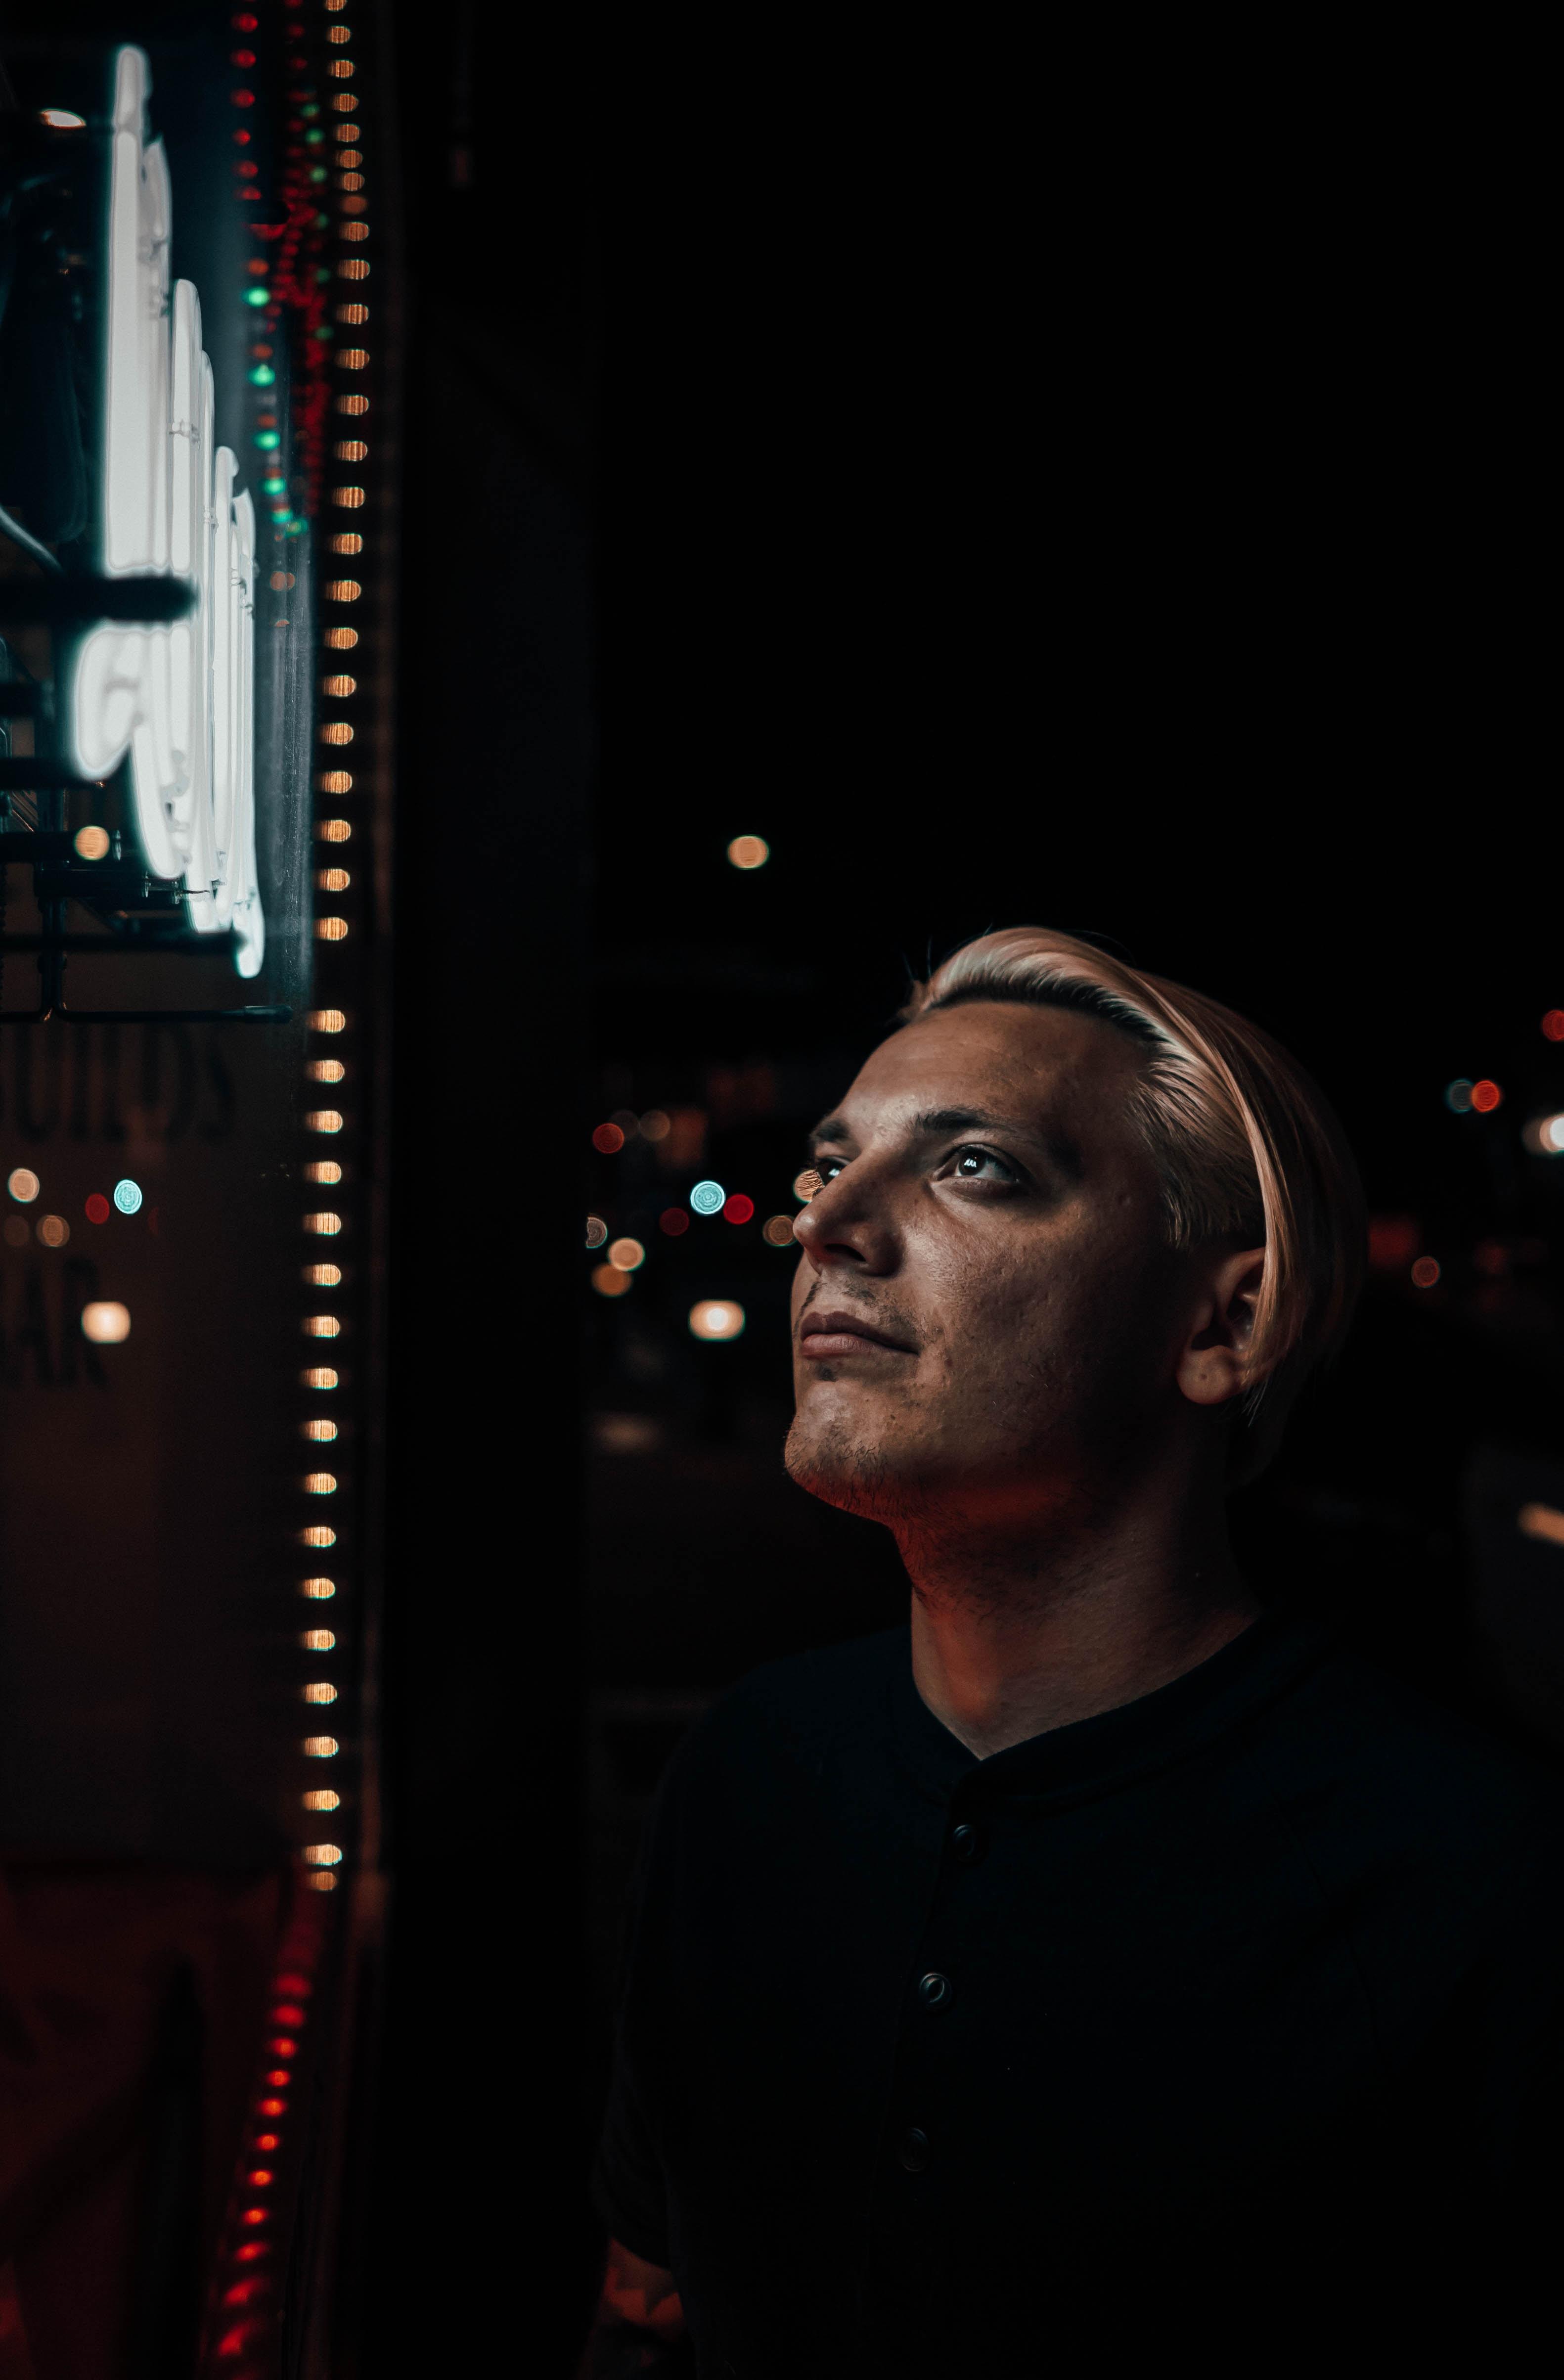 man staring at lighted signage